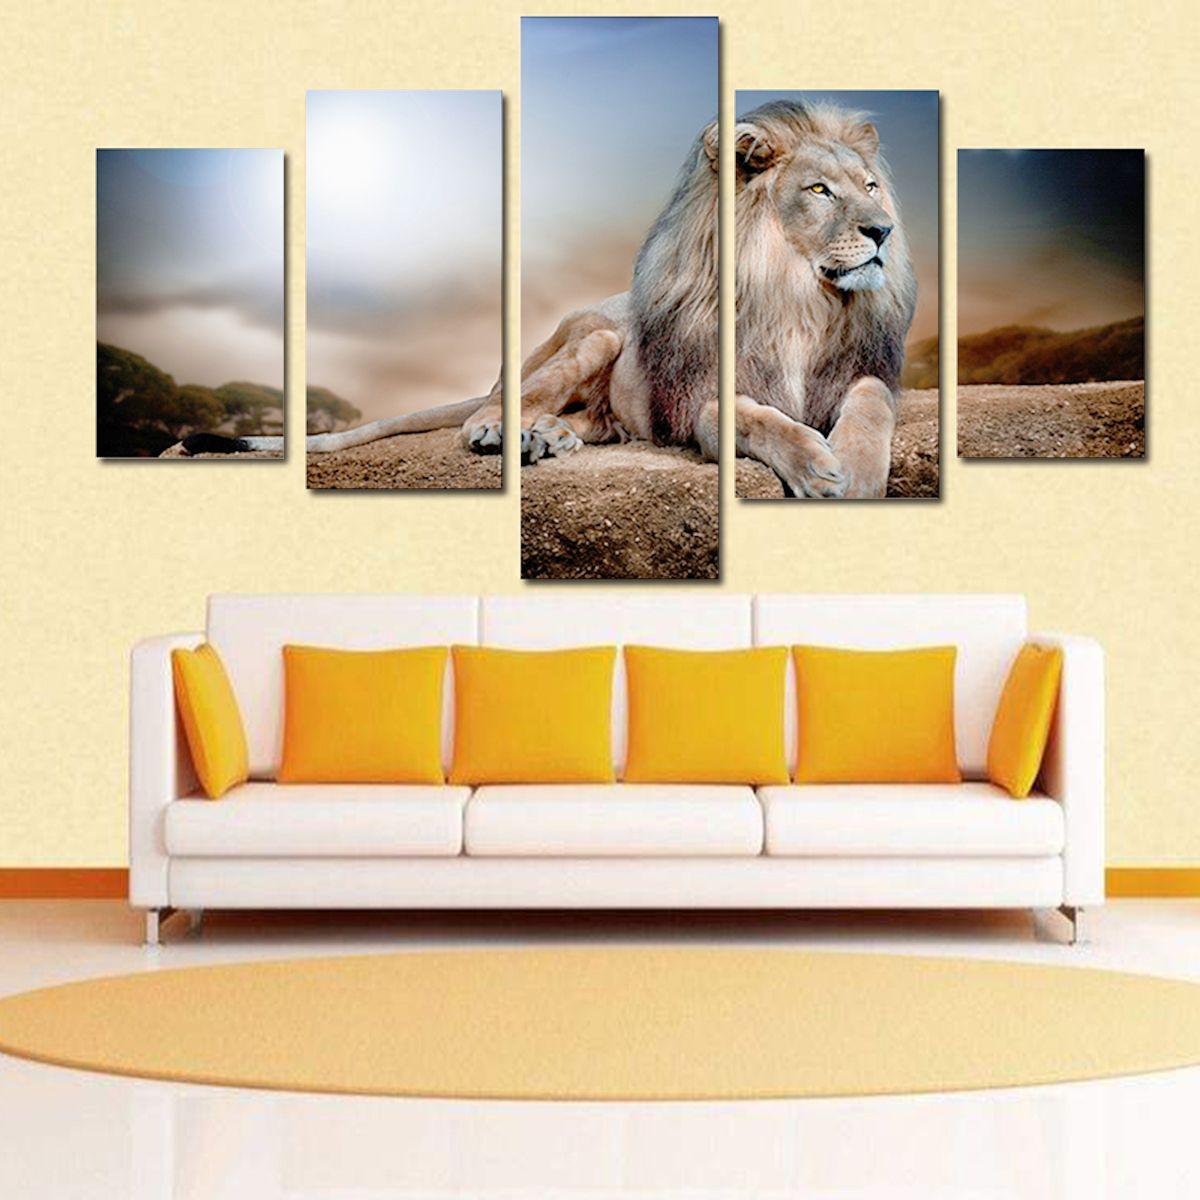 Five Recumbent Lions Hand-painted Painting Canvas Art Decorative ...